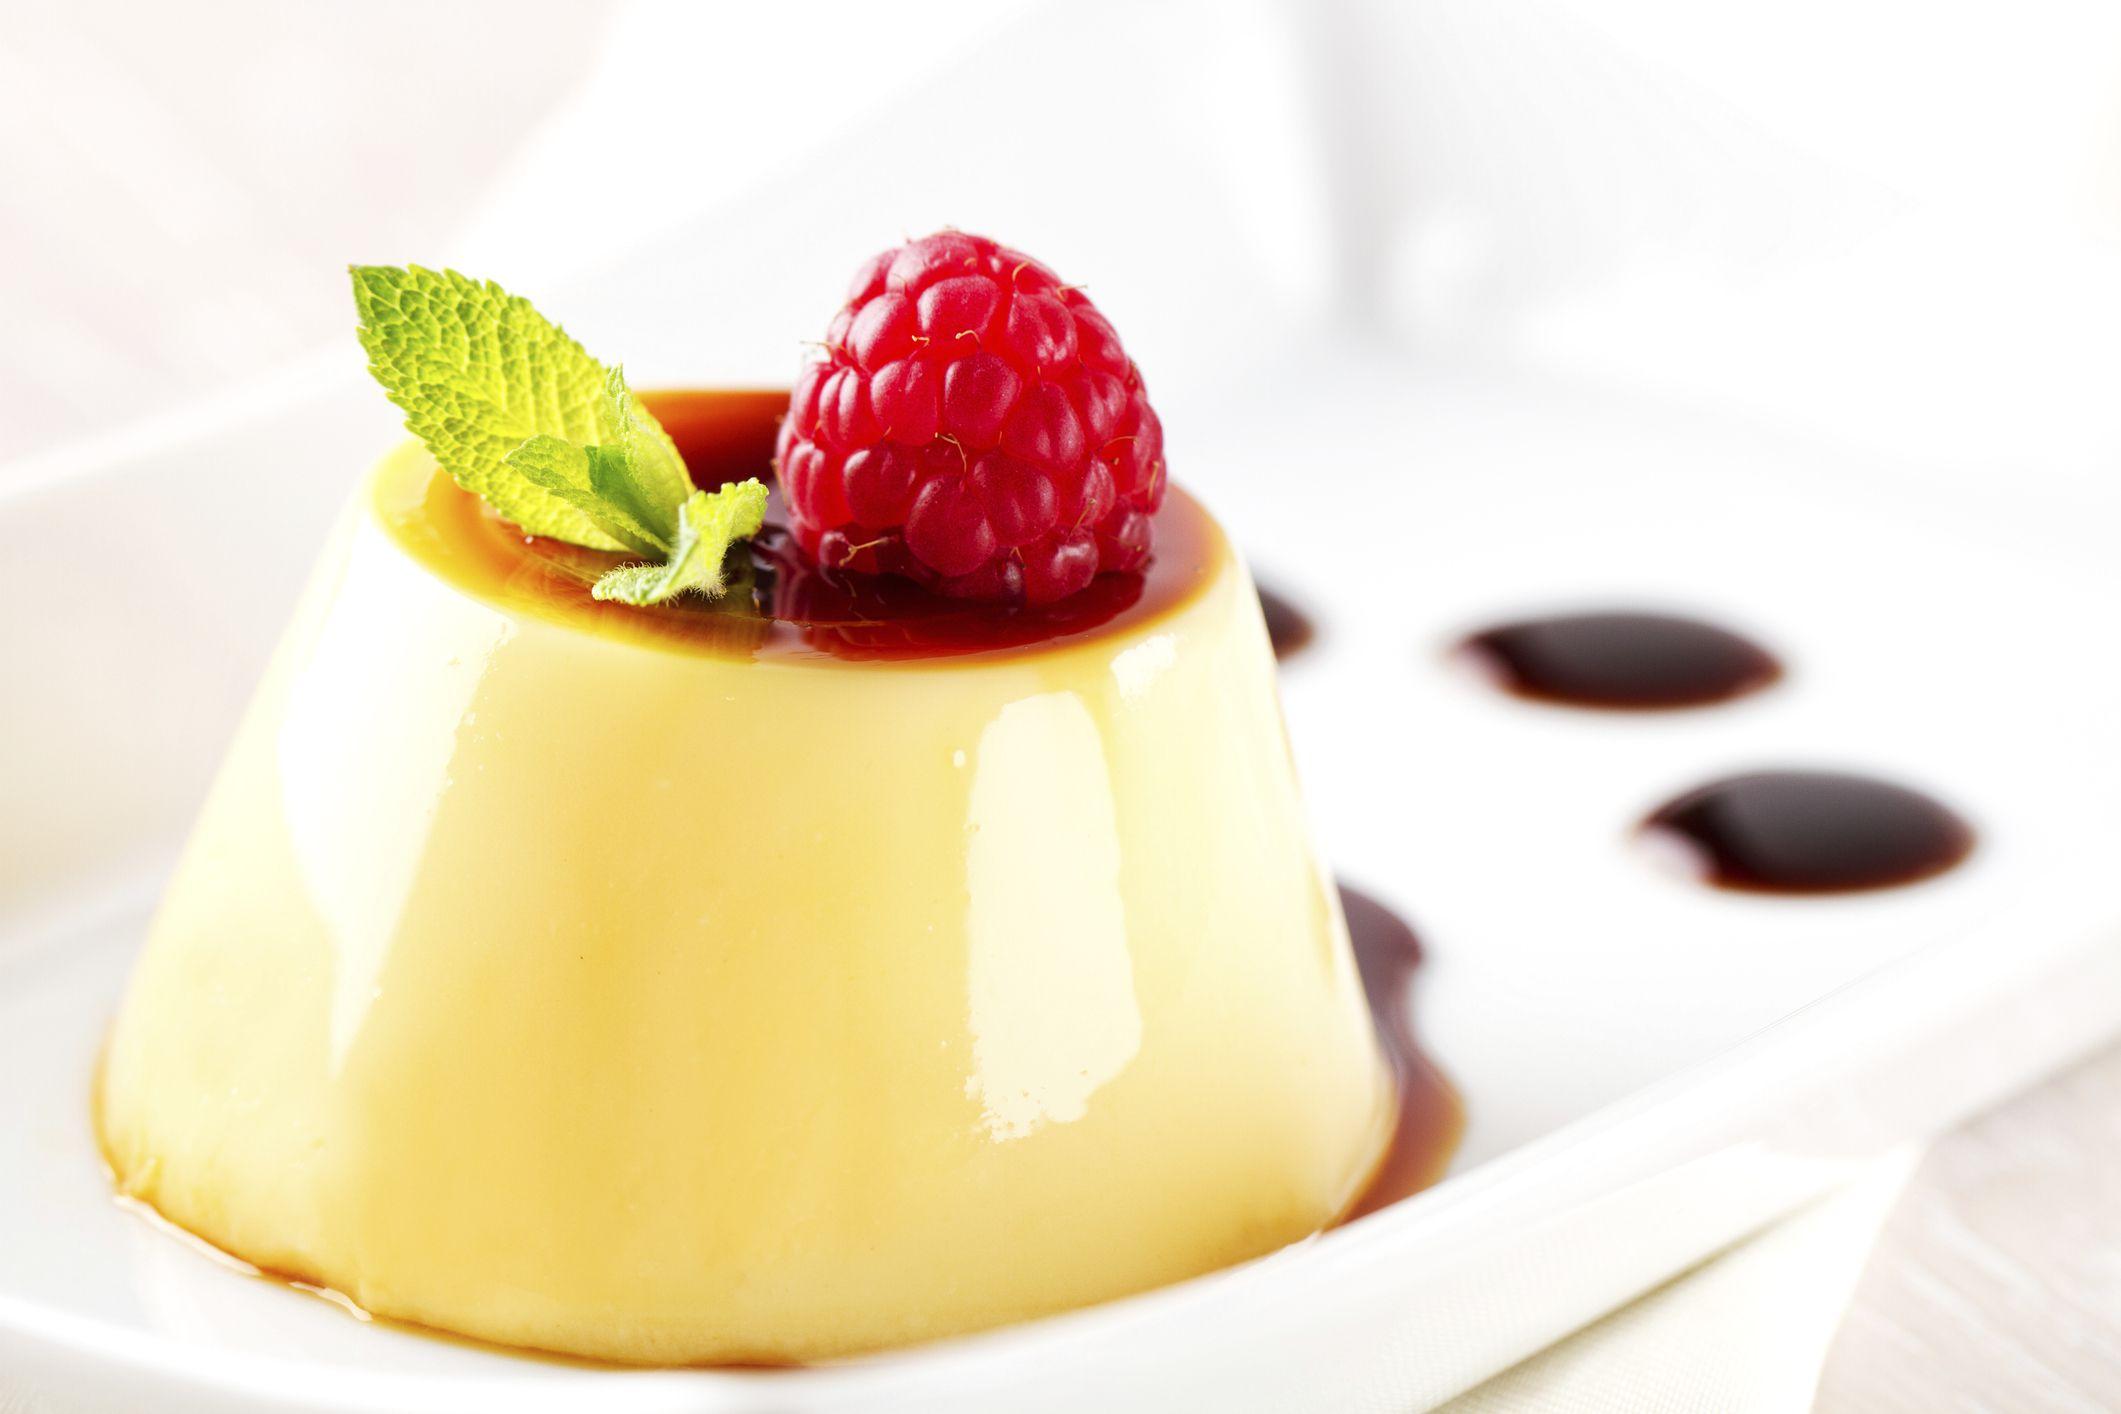 Classic French Crème au Caramel